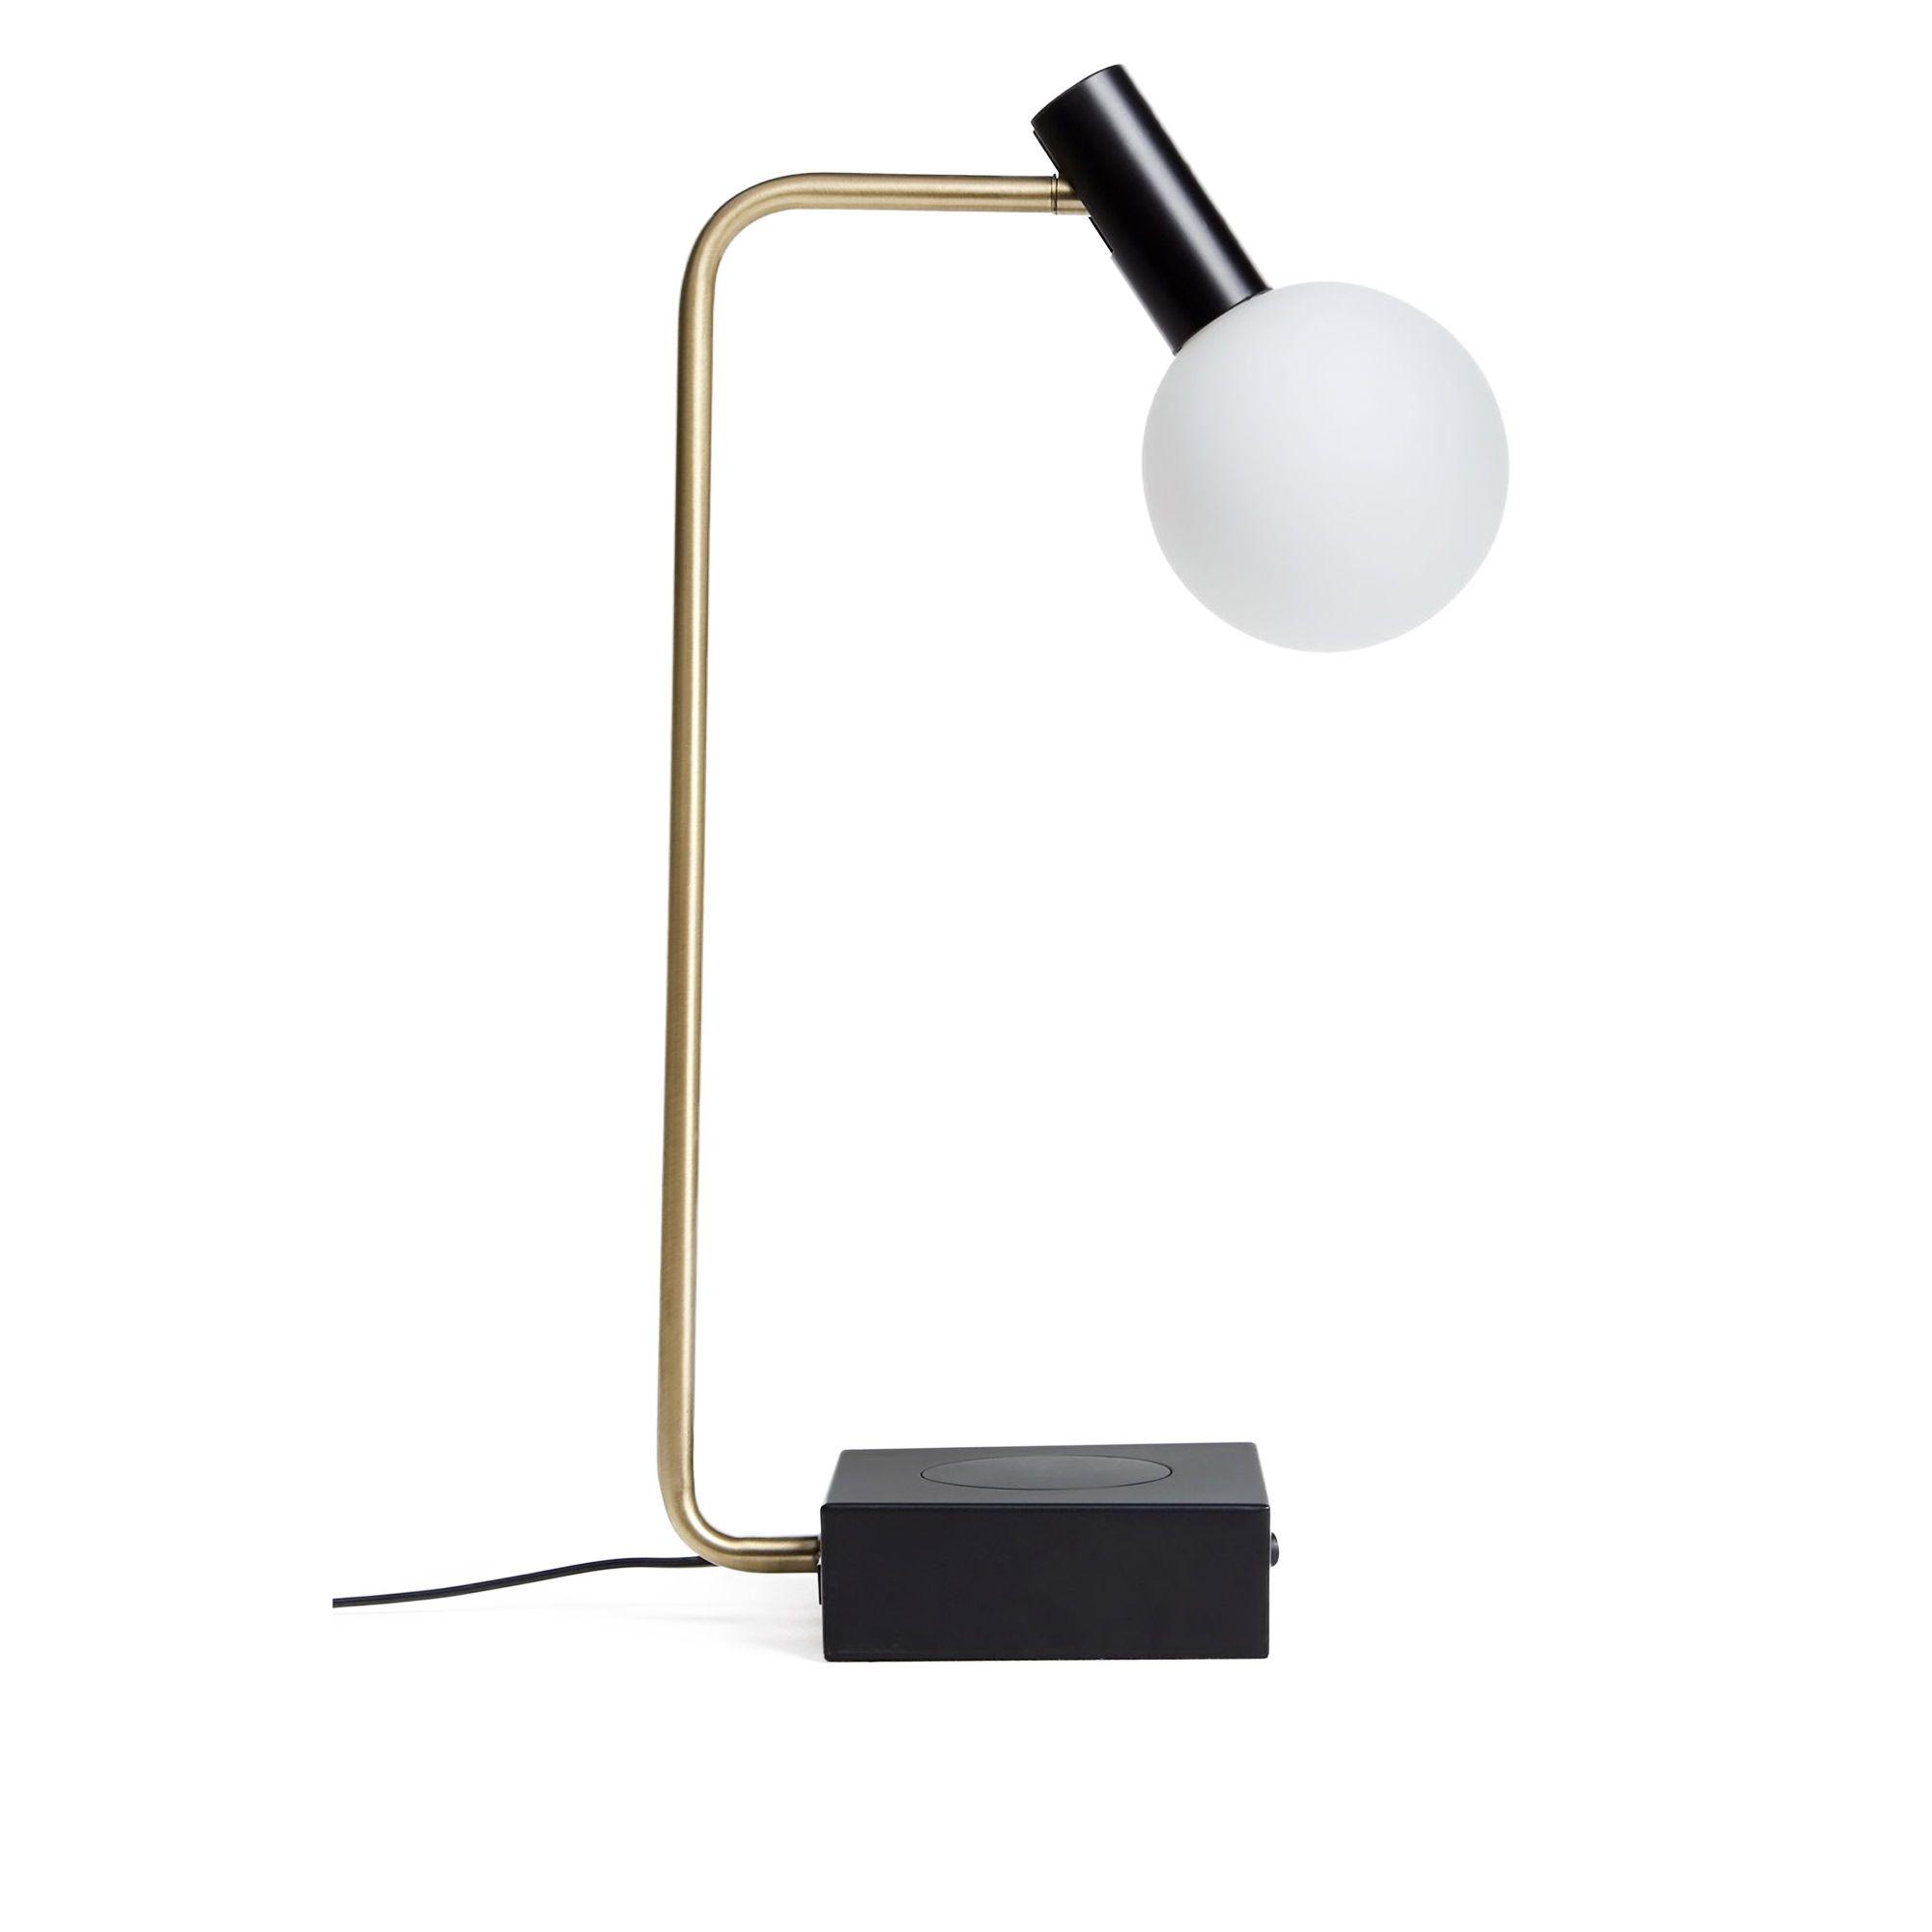 John Lewis & Partners Boundary Bar Ceiling Light, Brass/Pewter